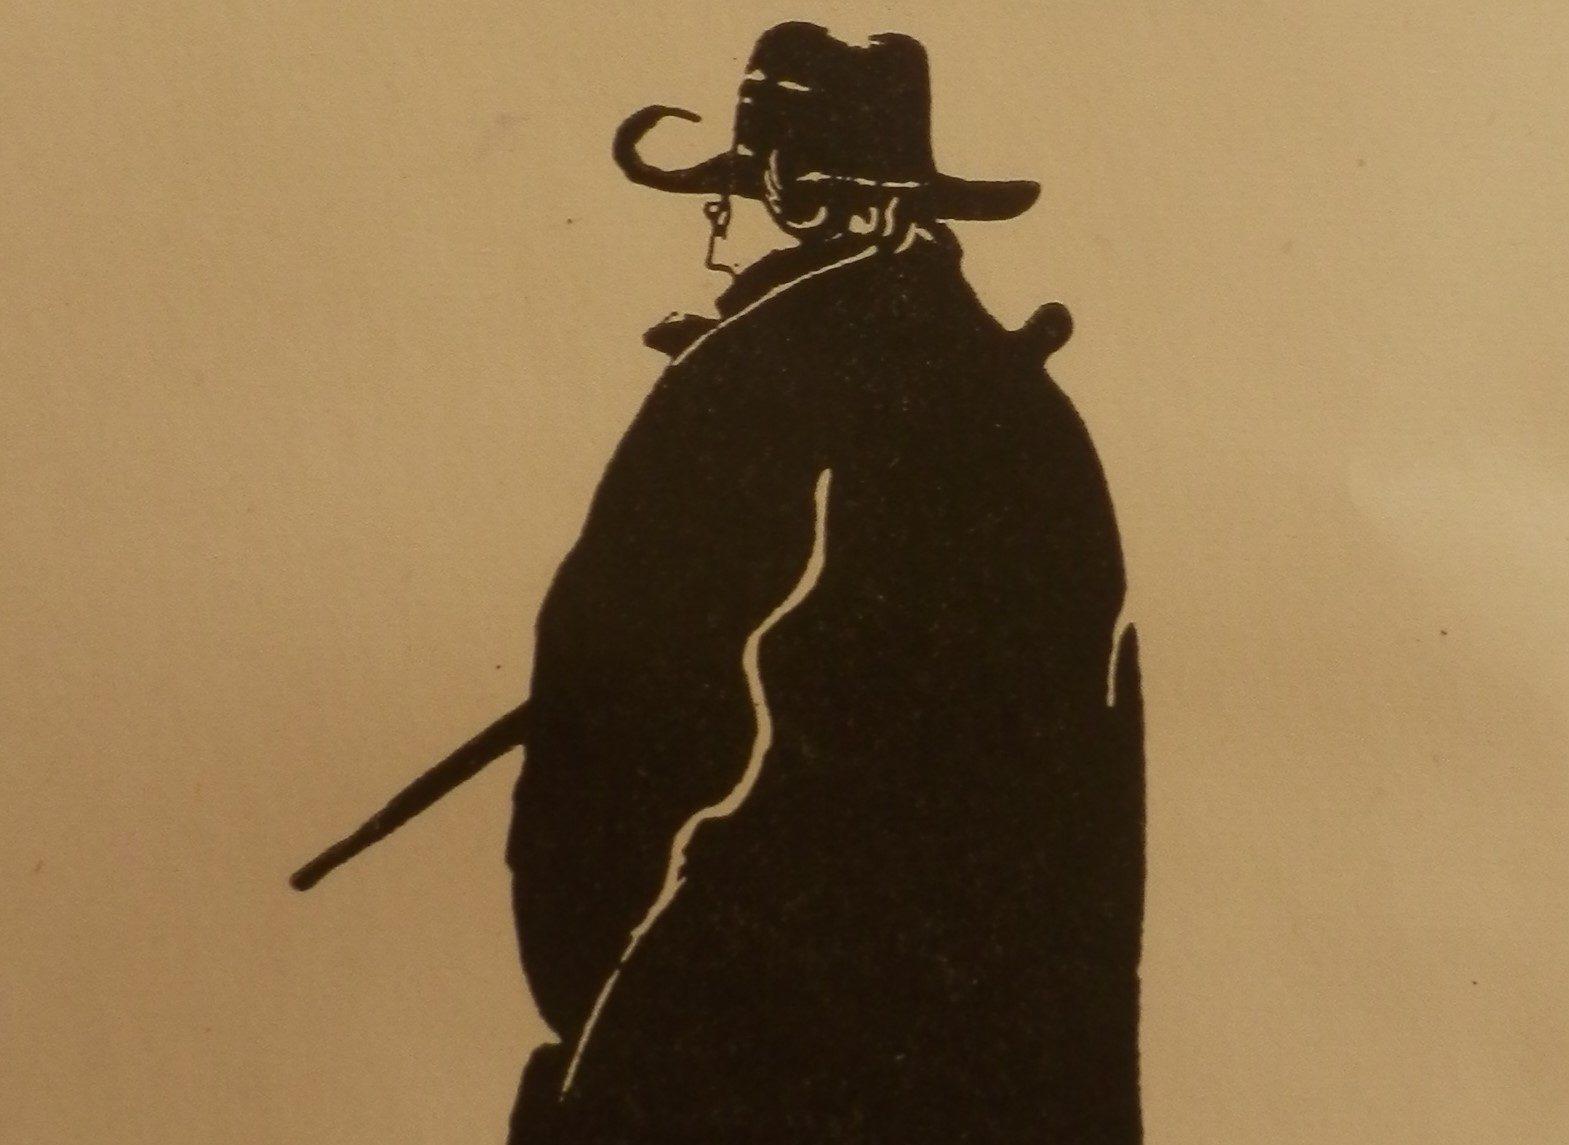 Edward Gordon Craig: Self-portrait. Woodcut engraving. Source: The Black Figures of Edward Gordon Craig (Wellingborough: Christopher Skelton, 1989). Reproduced by kind permission of the Edward Gordon Craig Estate